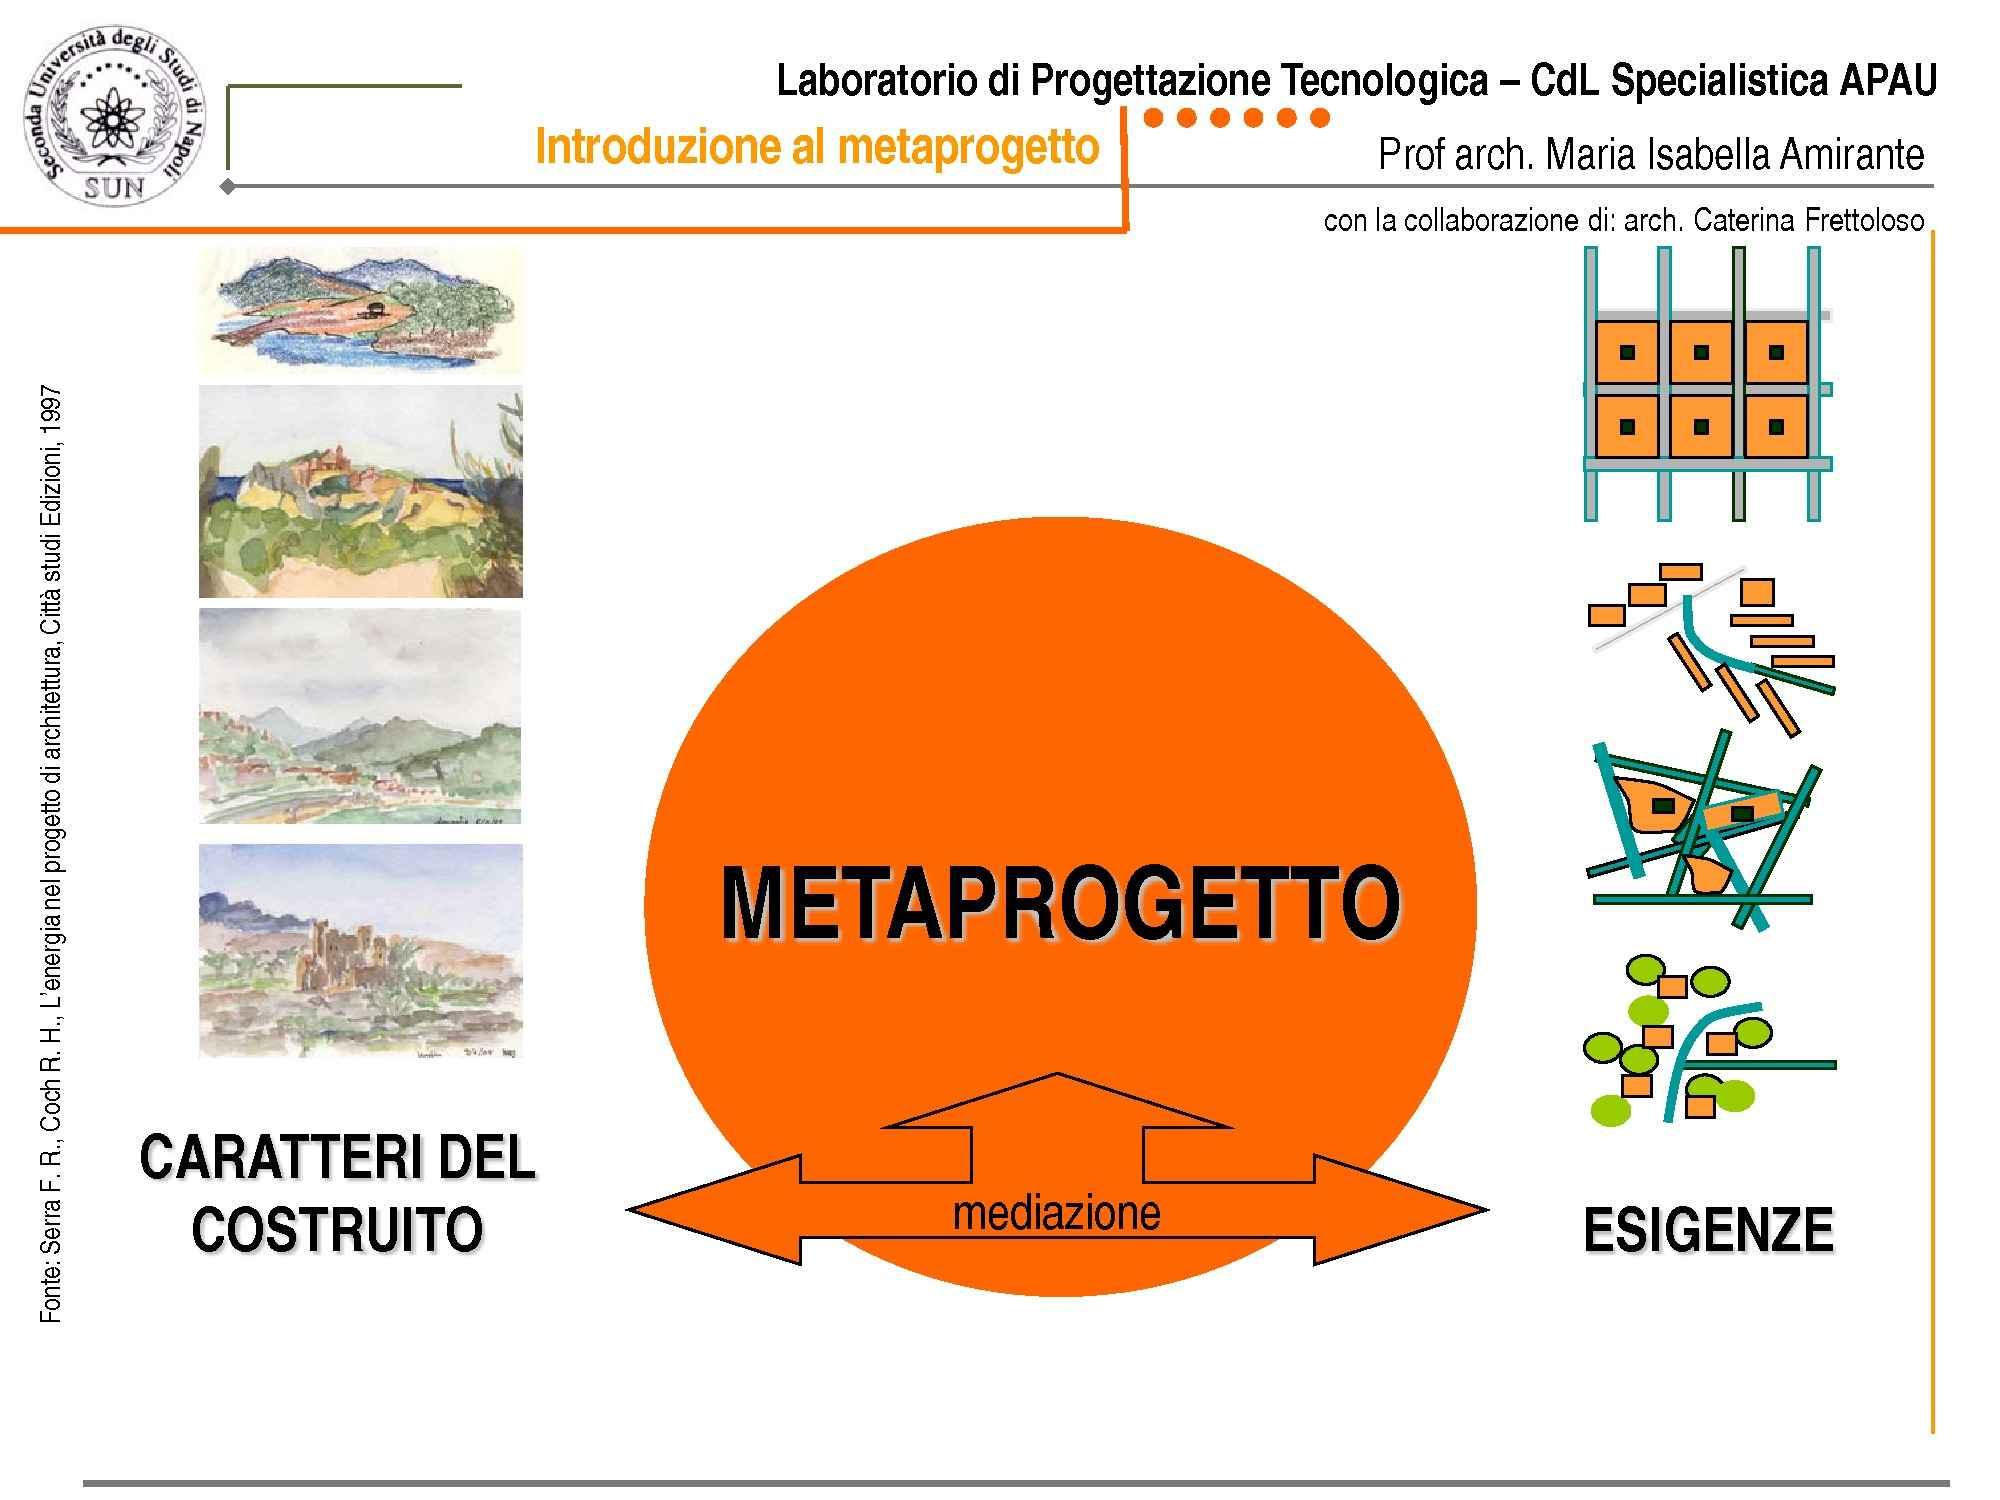 Metaprogetto